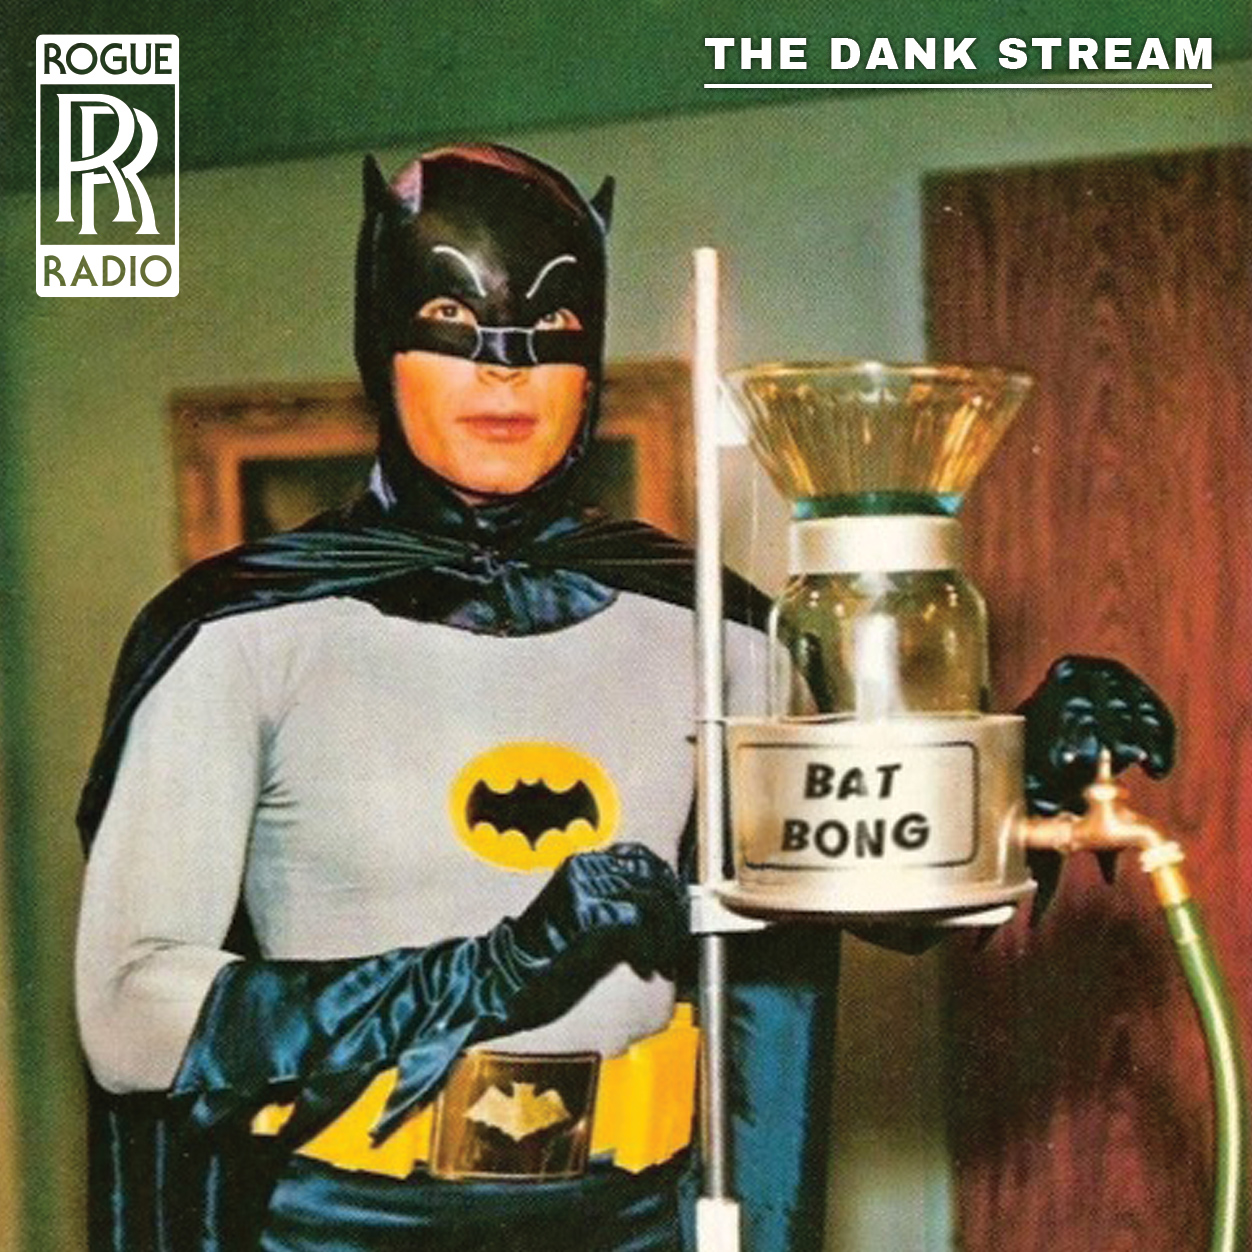 mix-img-dank-stream